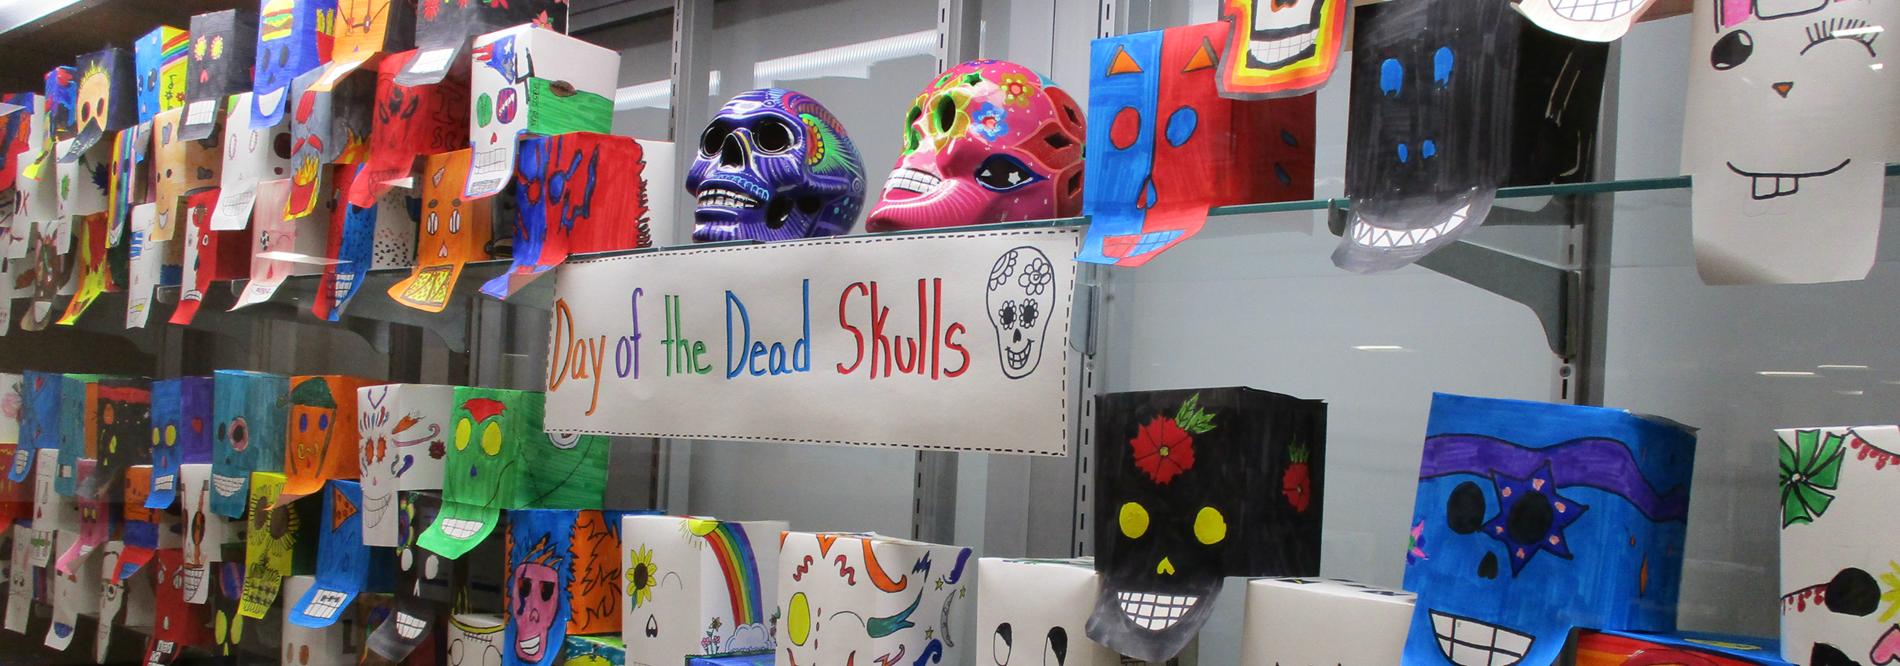 Moser Fall Student Artwork - Day of the Dead Skulls